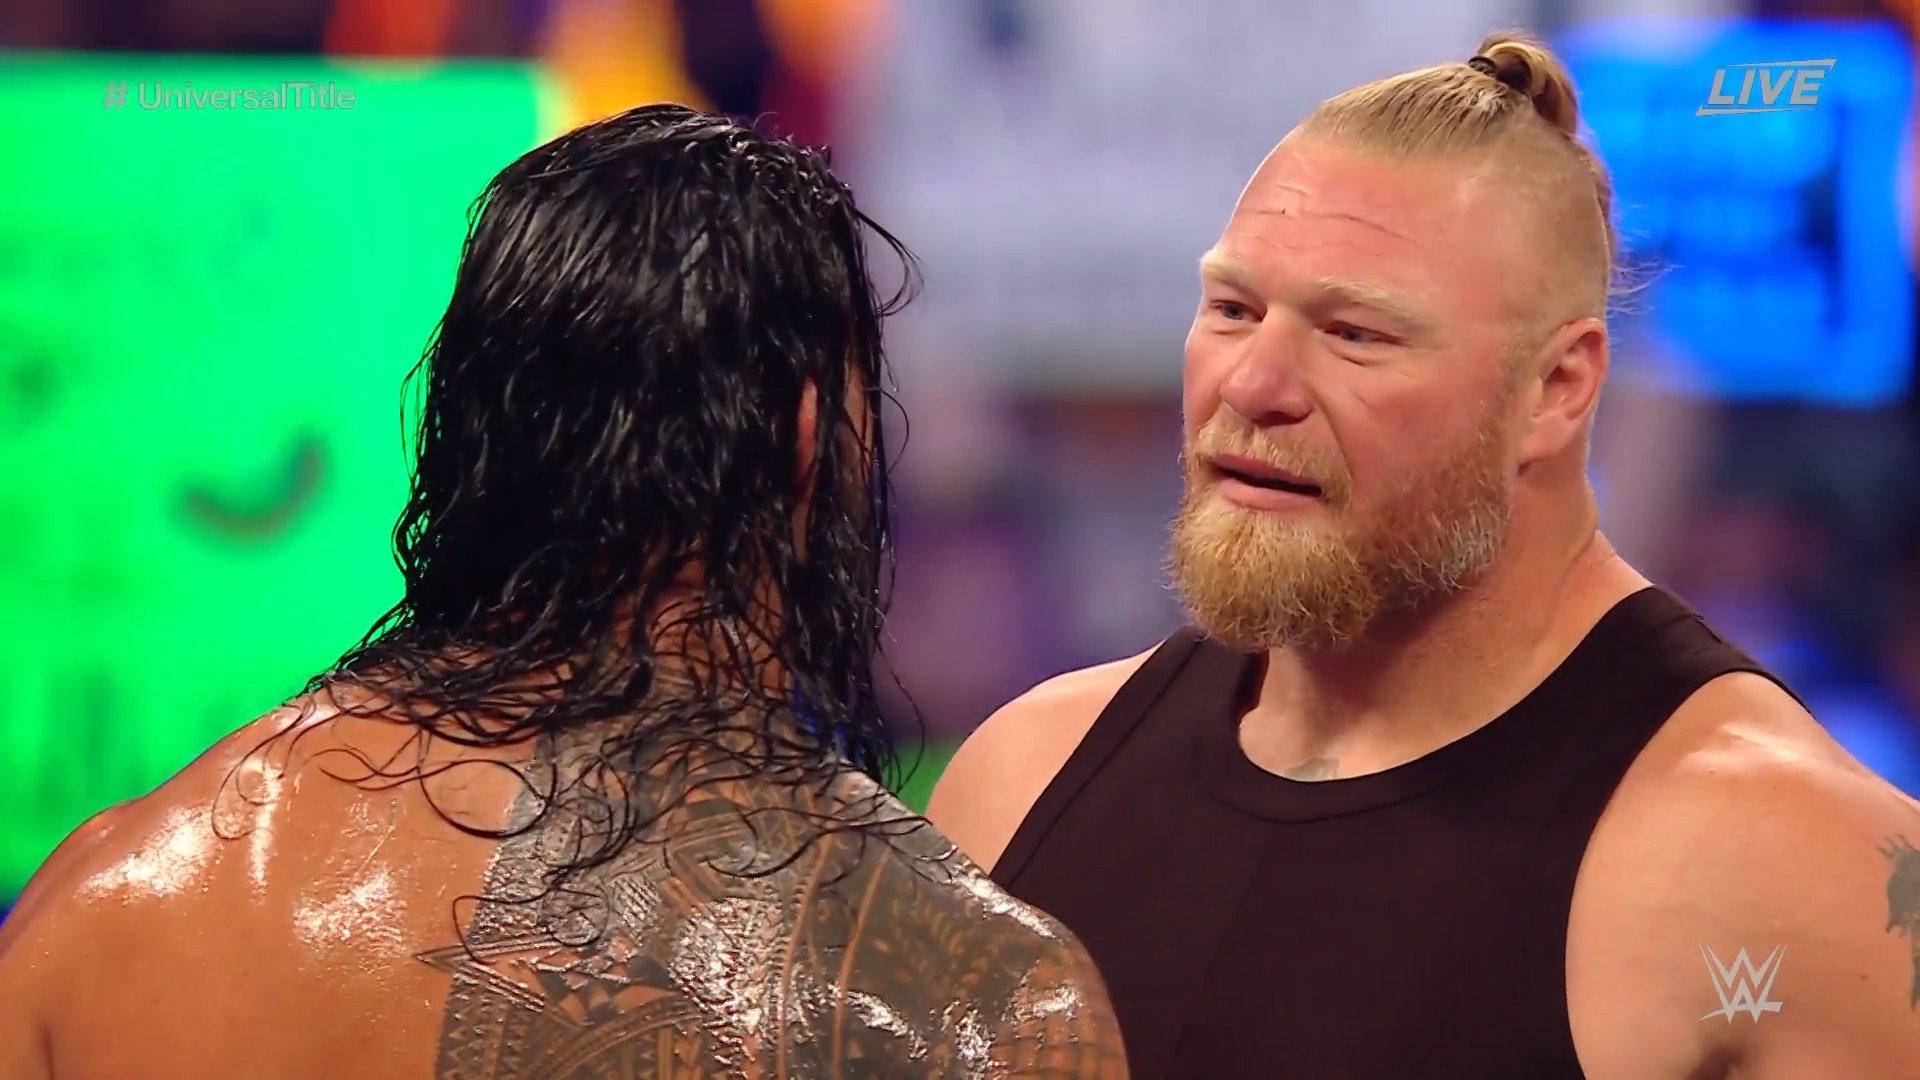 Brock Lesnar retorna no WWE SummerSlam para confrontar Roman Reigns